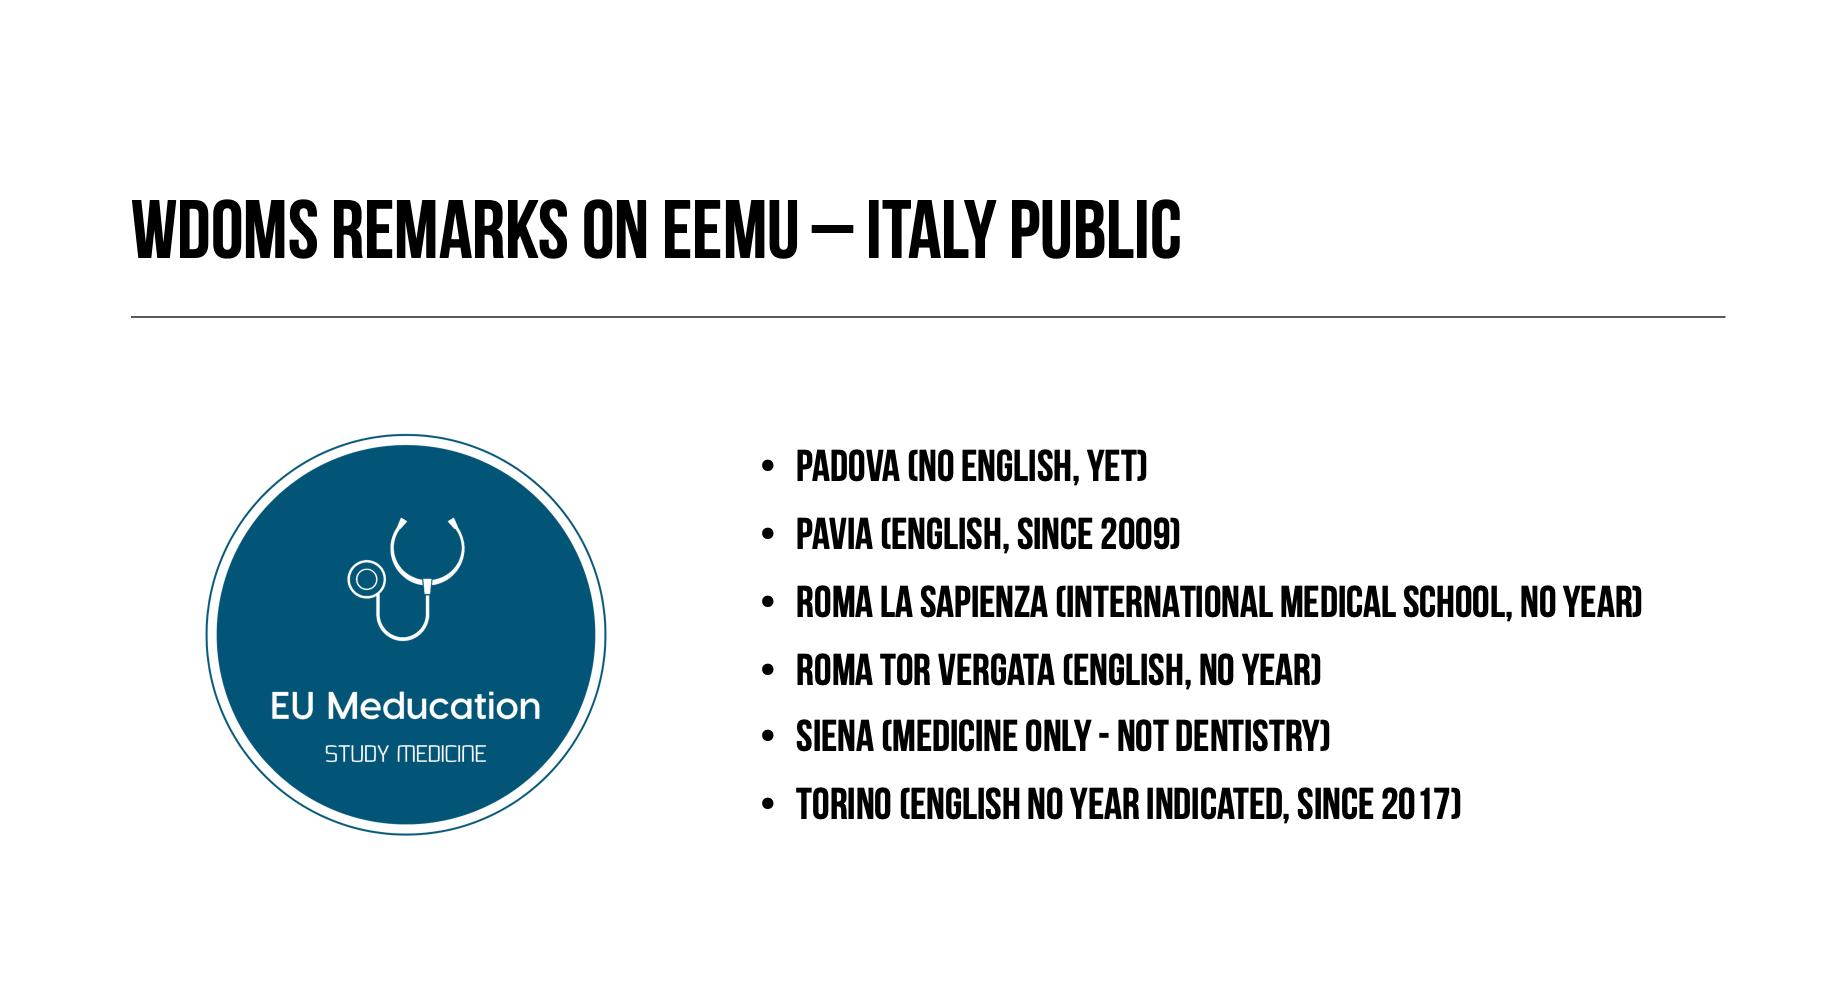 WDOMS-Italy-Public-2